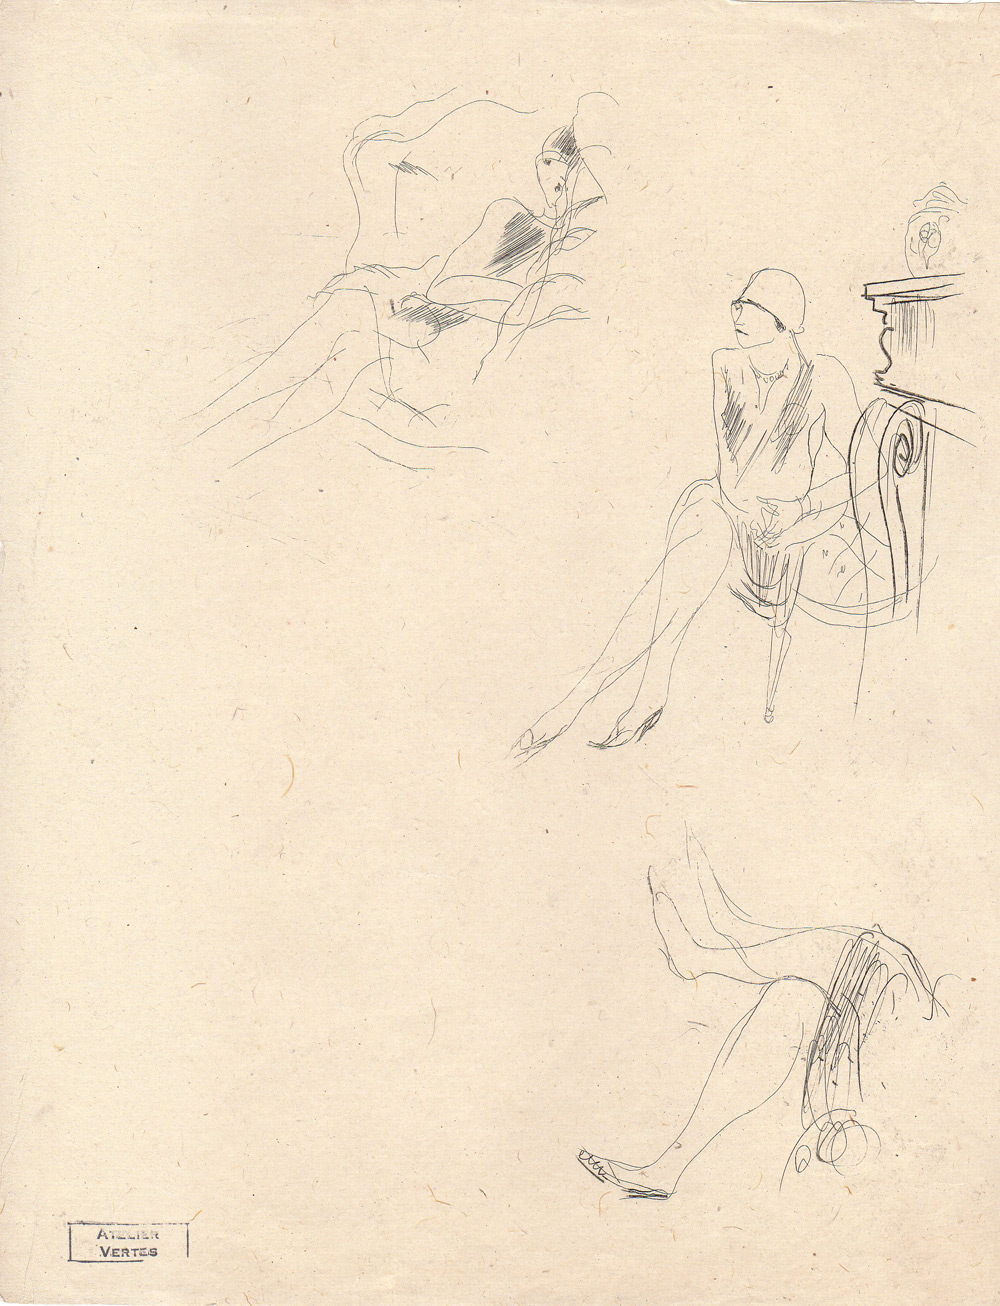 Marcel Vertès | Femmes assises | Marcel Vertès